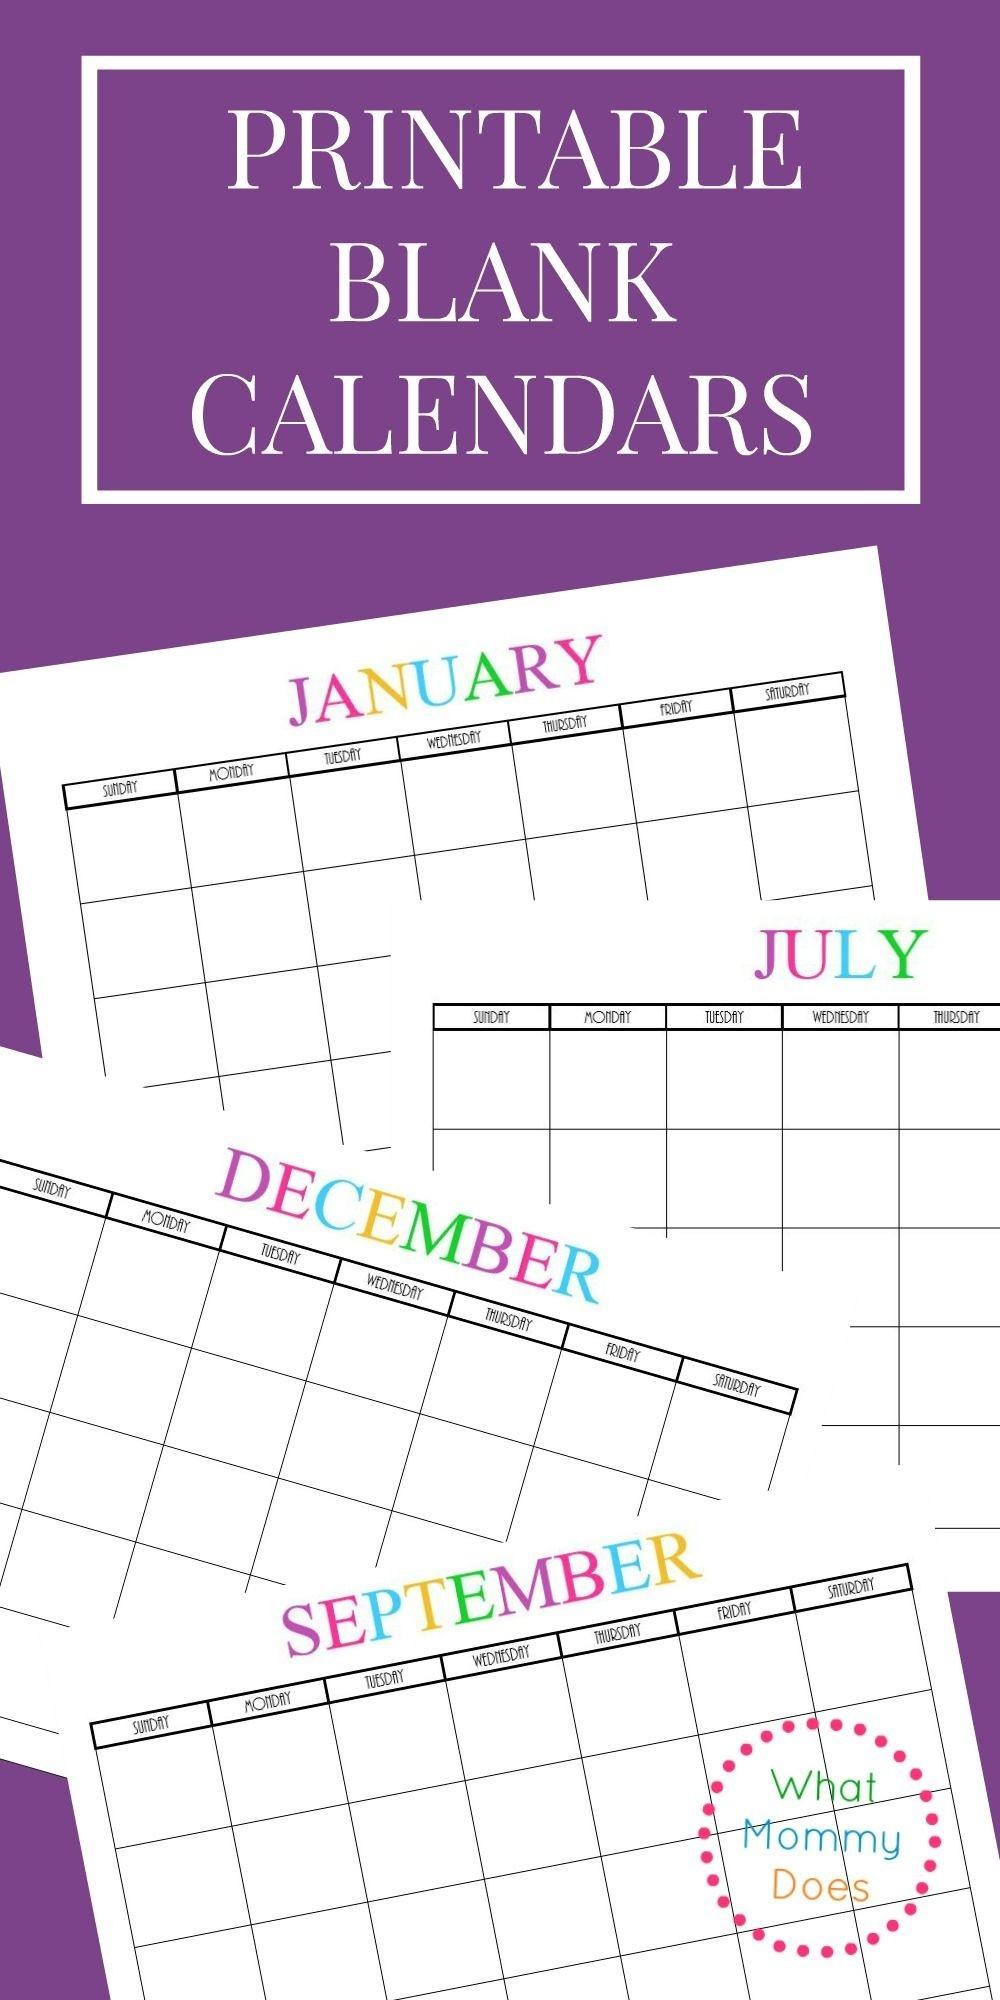 2020 Free Printable 8.5 X11 Monthly Calendars | Calendar-Printable 2020 Blank Calendar On 8 X 11 Size